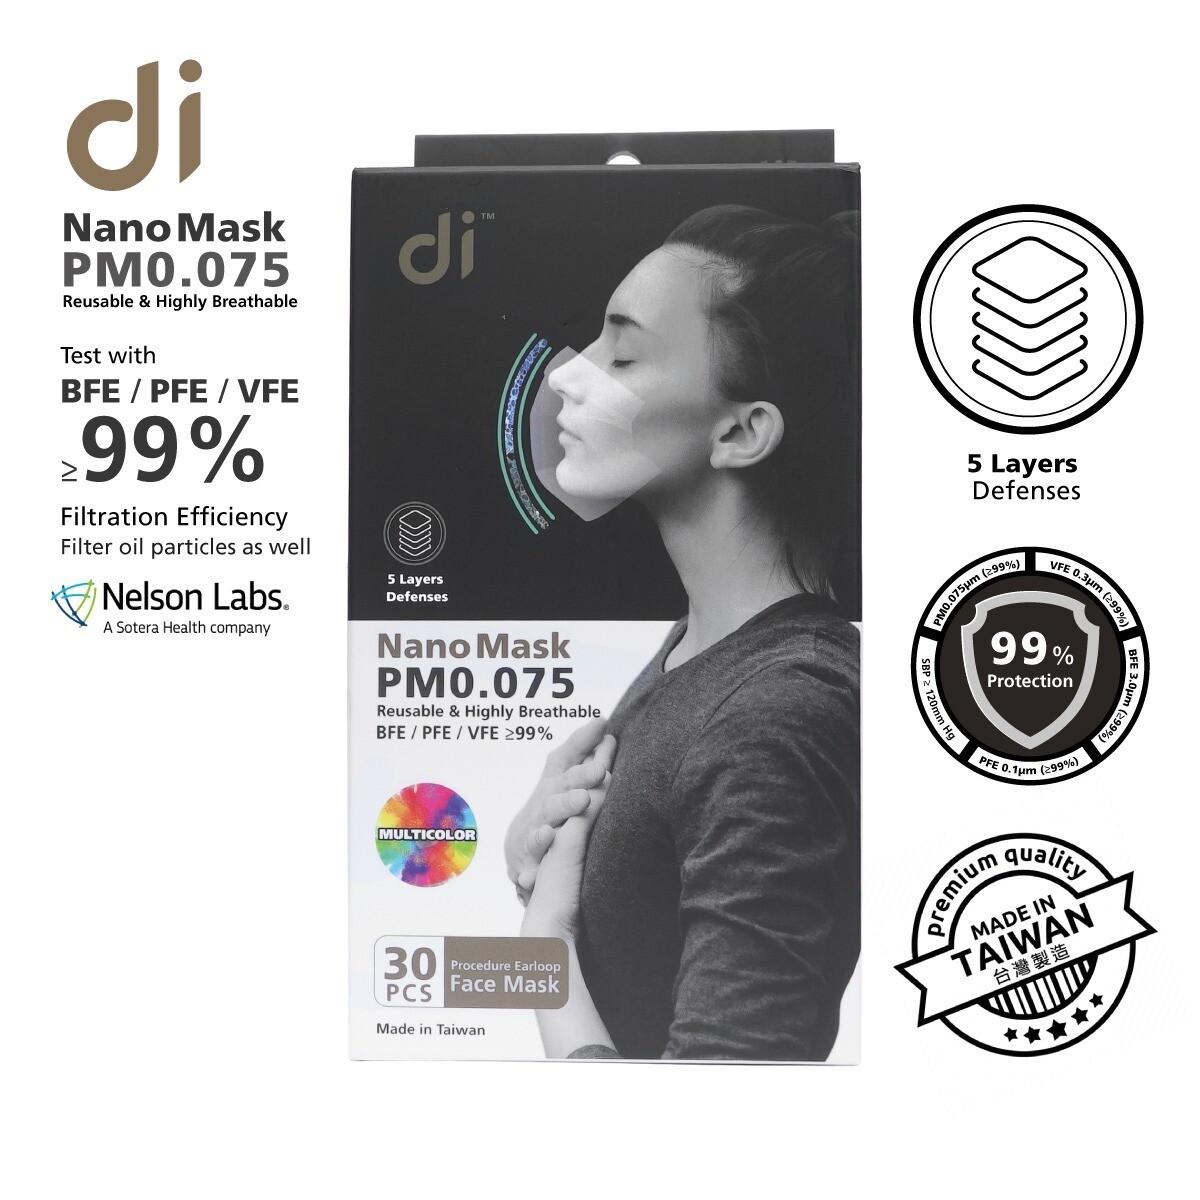 Dicarre Nano Face Mask Reusable PM 0.075, ASTM level 3 , Kickstarter Recommended